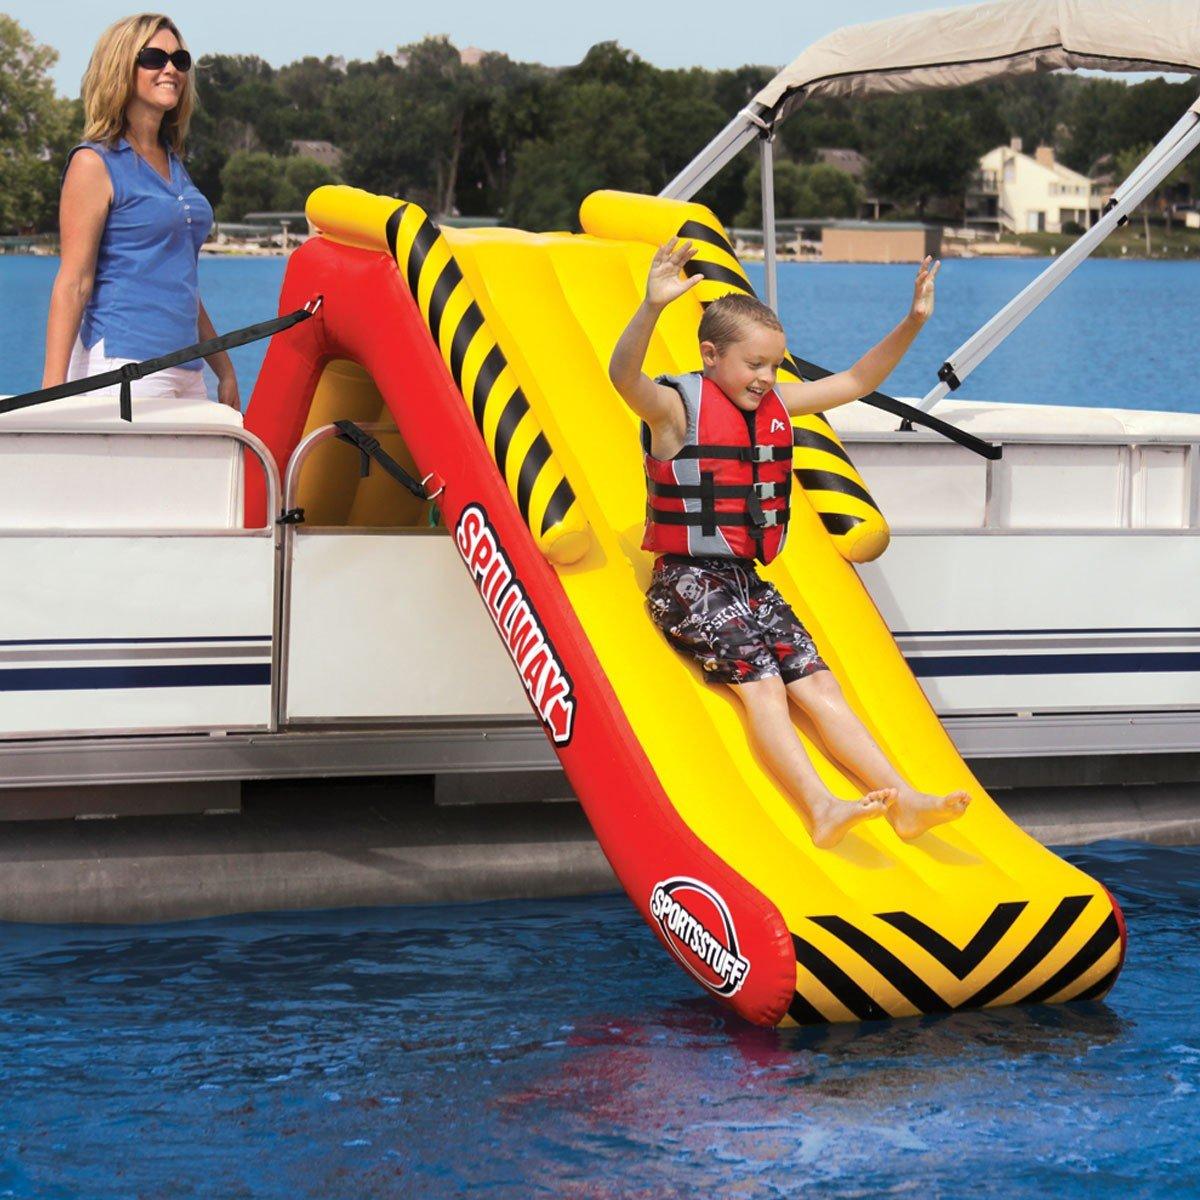 Sportsstuff Spillway Inflatable Boat Slide Rutsche